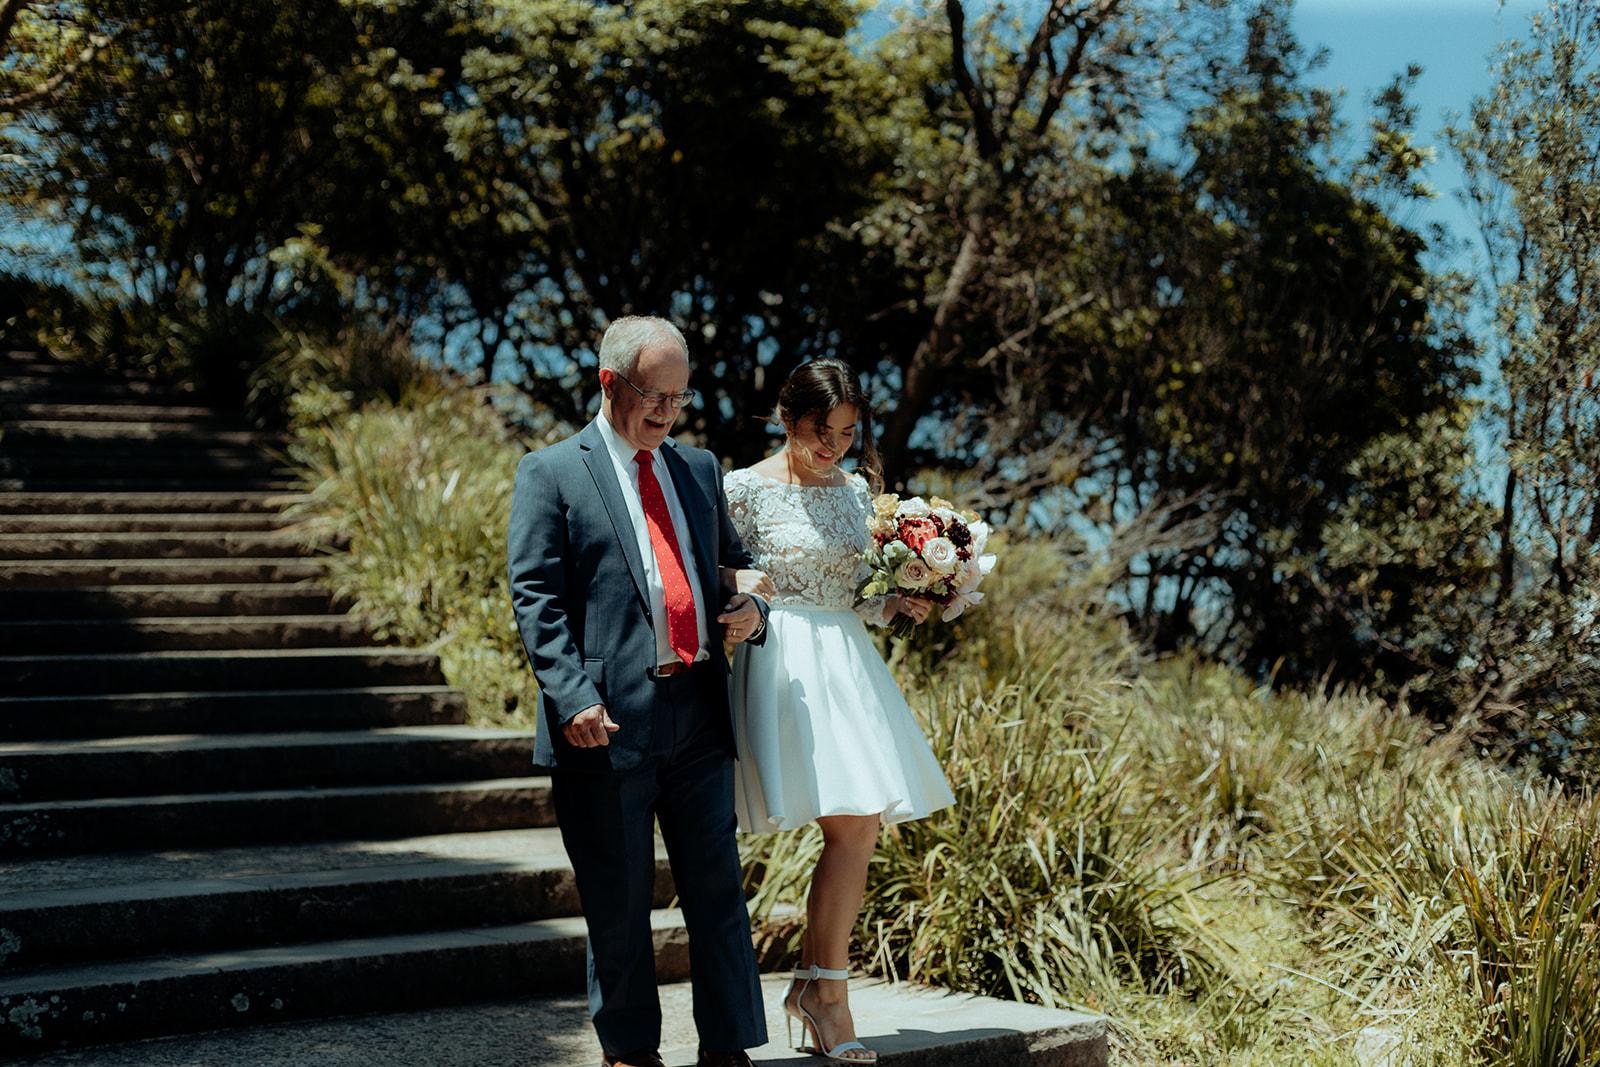 Karis and Oli_Sydney Wedding_Bradleys Head_Holly Medway Photography-205.jpg